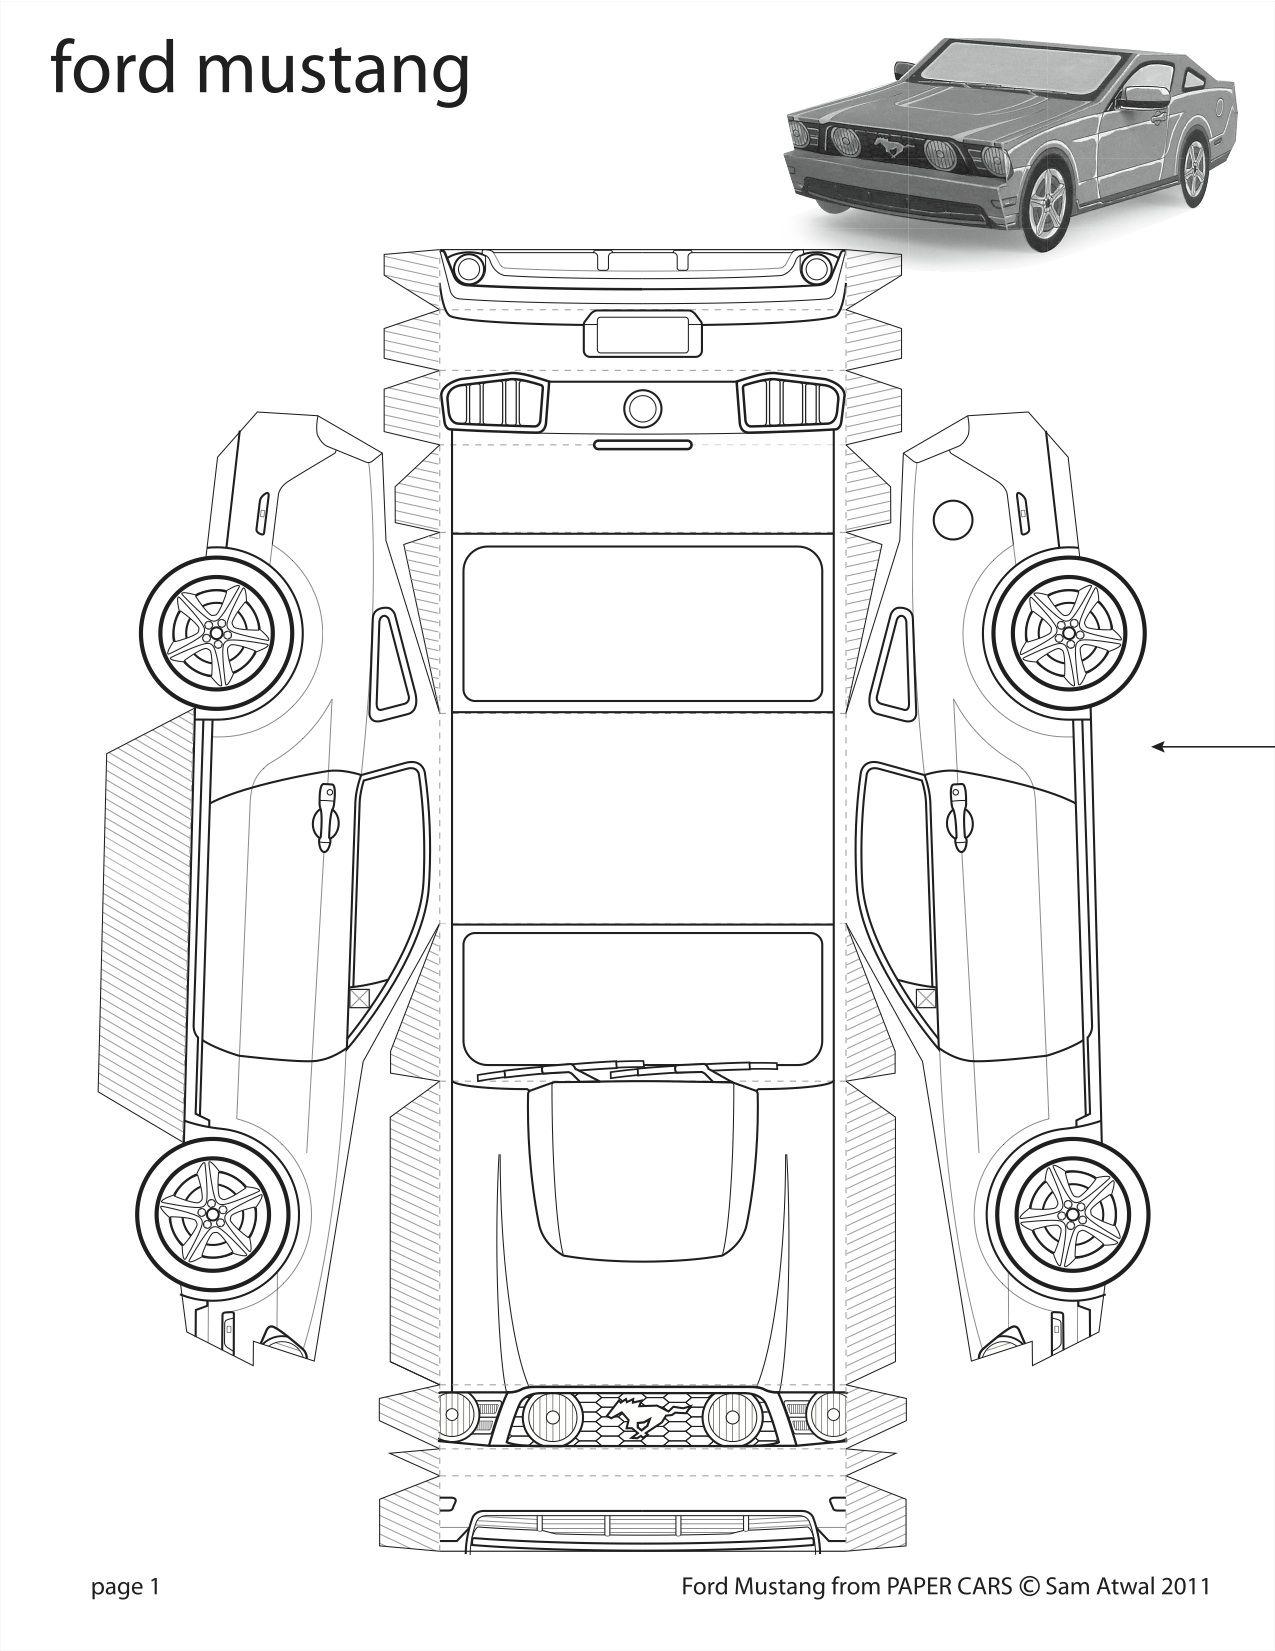 How To Make Acast Cardboard Car